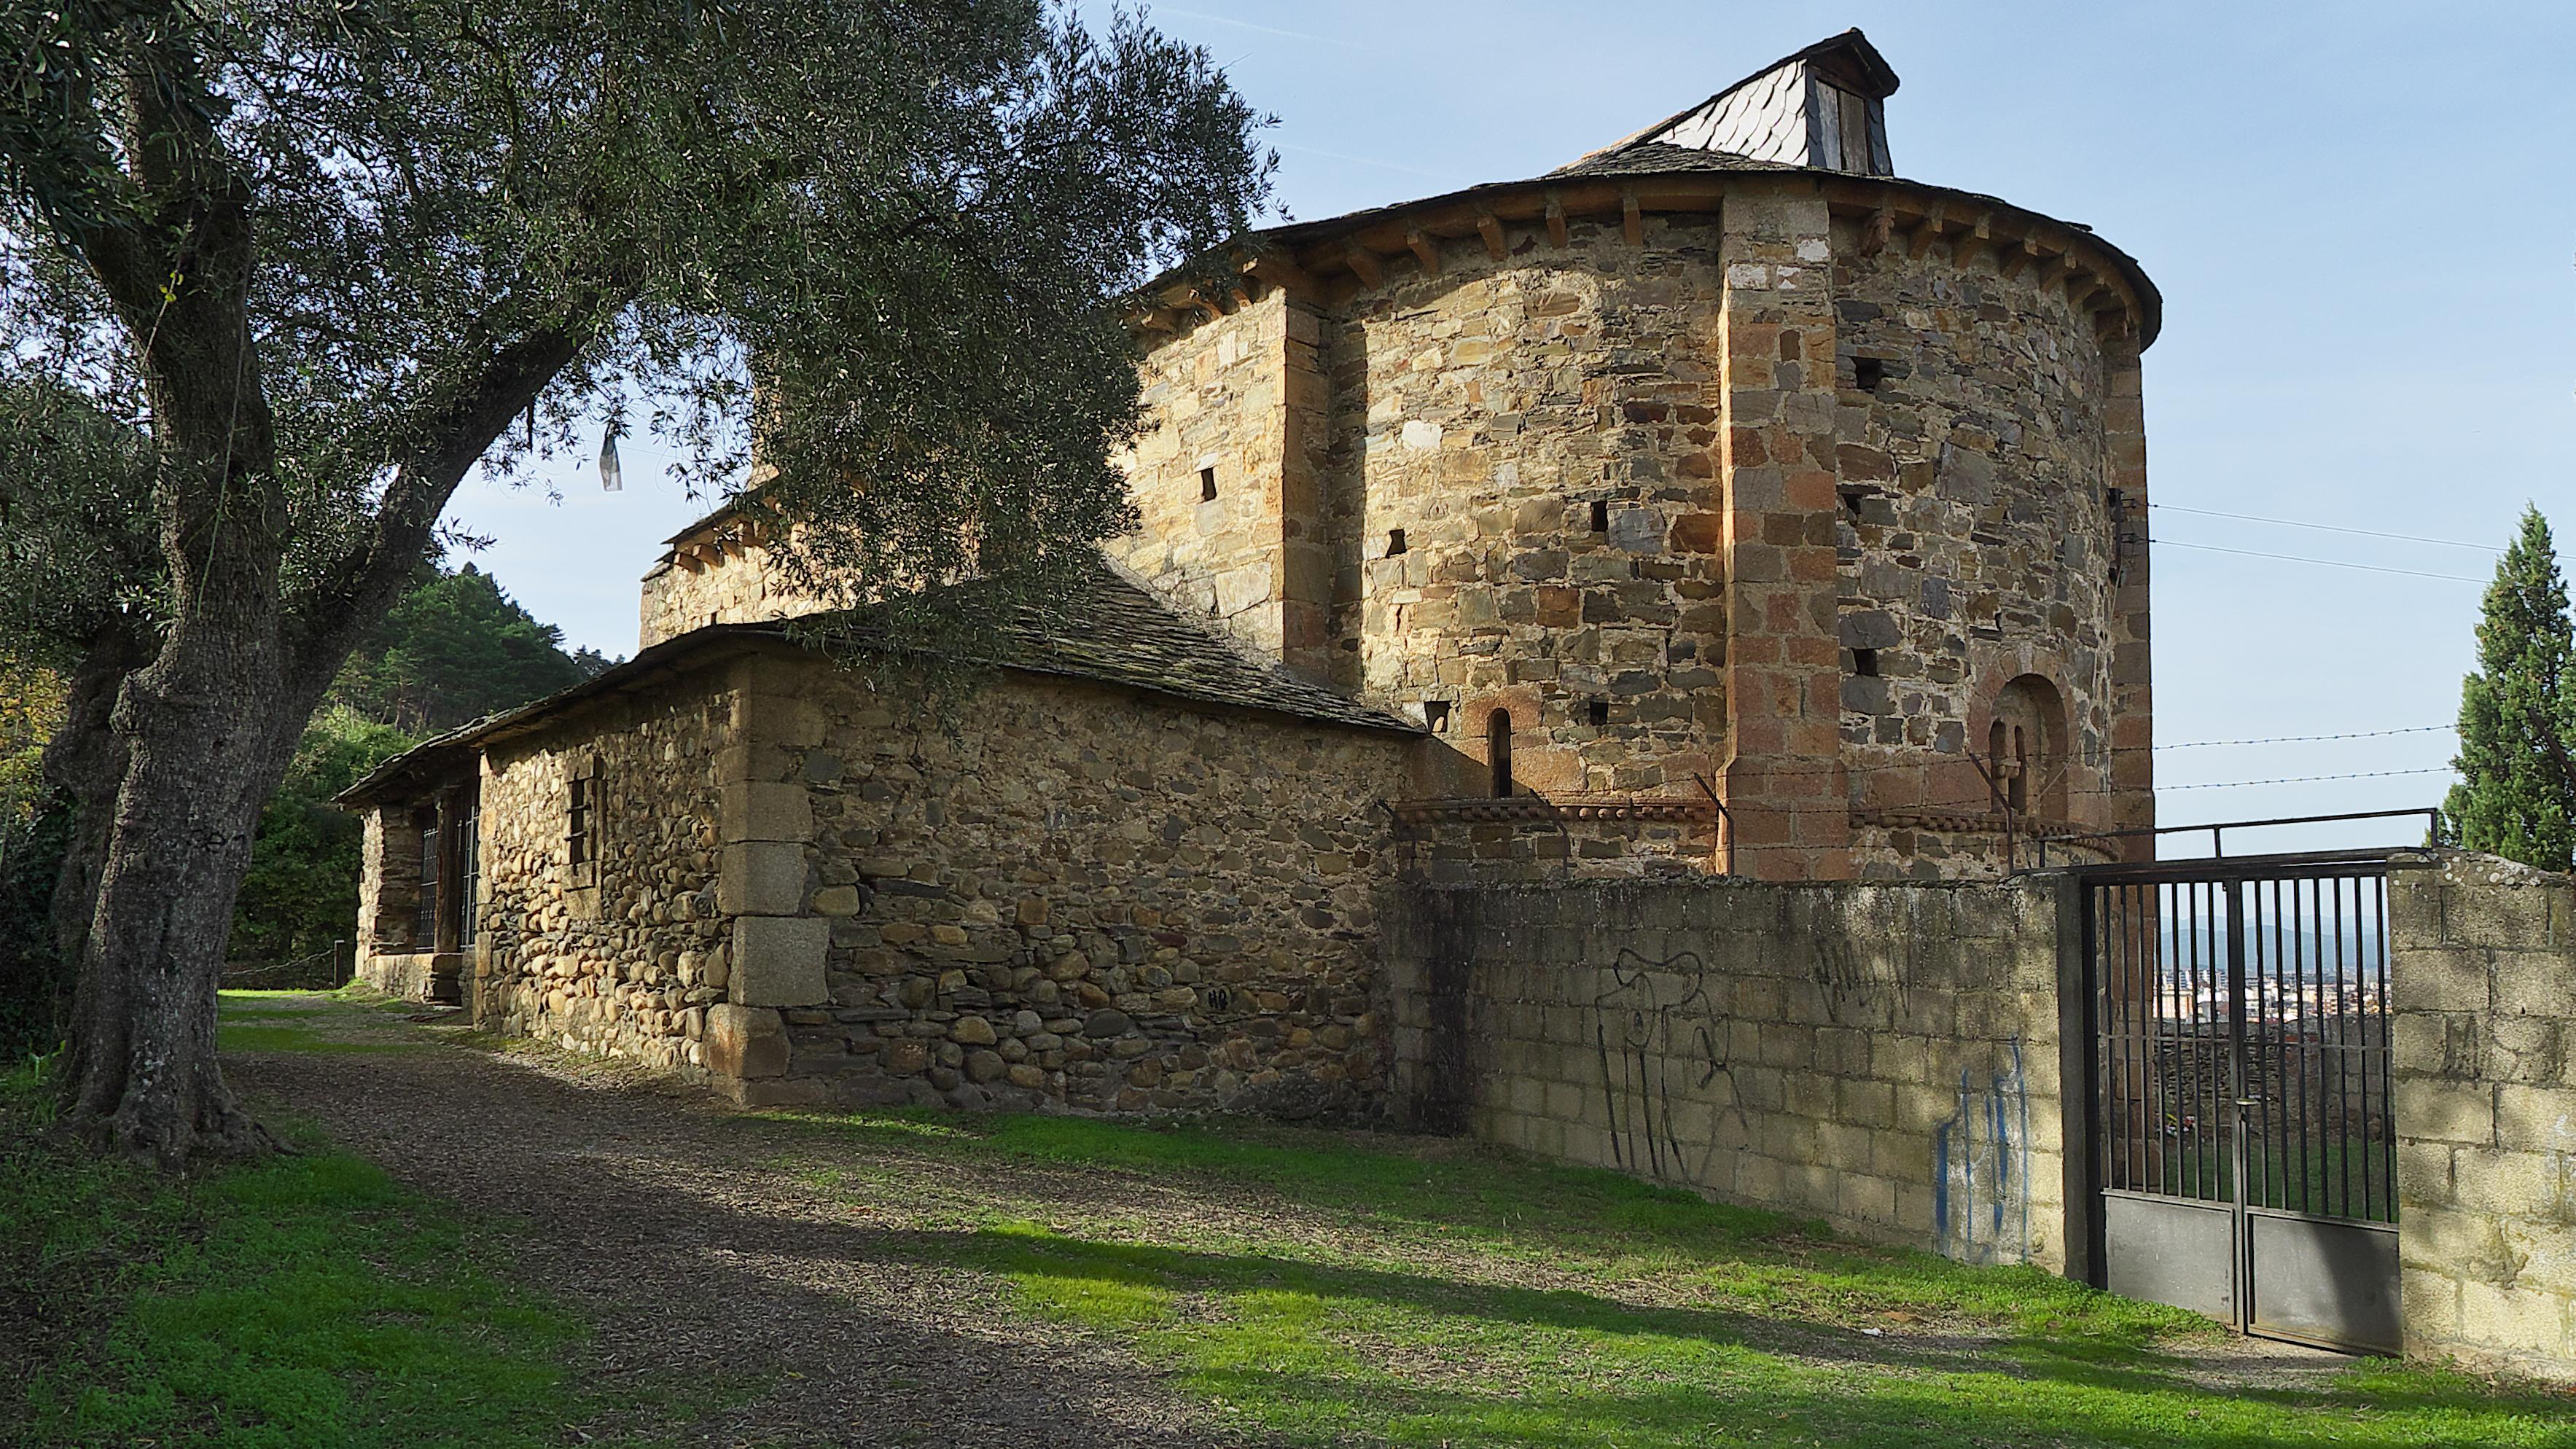 Archivo:Iglesia de Santa María de Vizbayo (Otero, Ponferrada).jpg -  Wikipedia, la enciclopedia libre